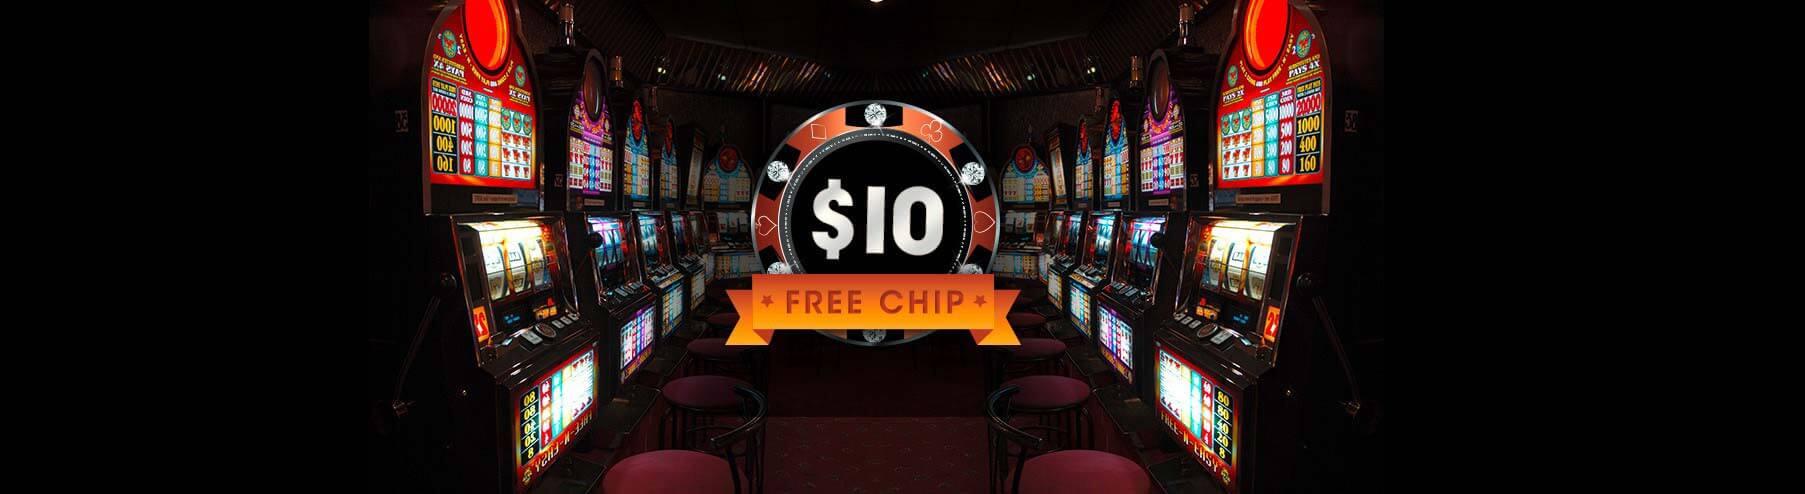 jackpot capital casino free chip